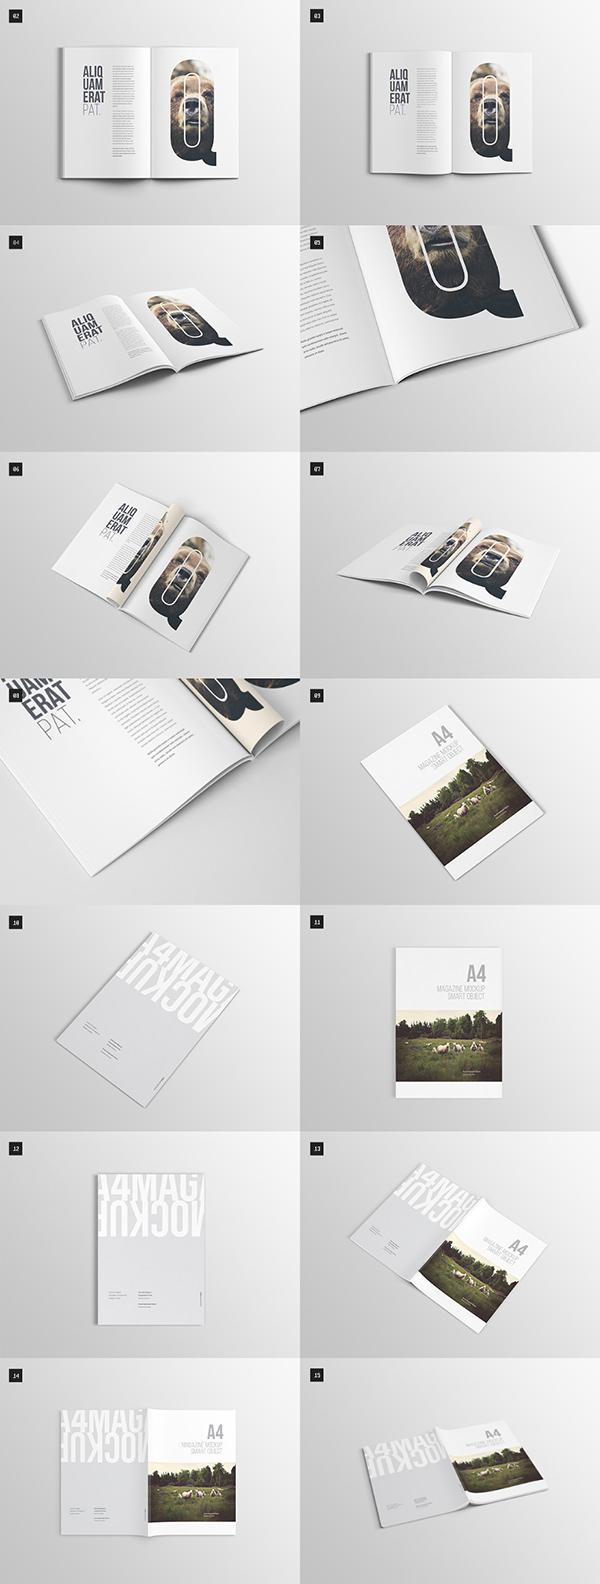 Download Gratis Mockup Majalah, Brosur, Buku, Cover - A4 Magazine Mock-up